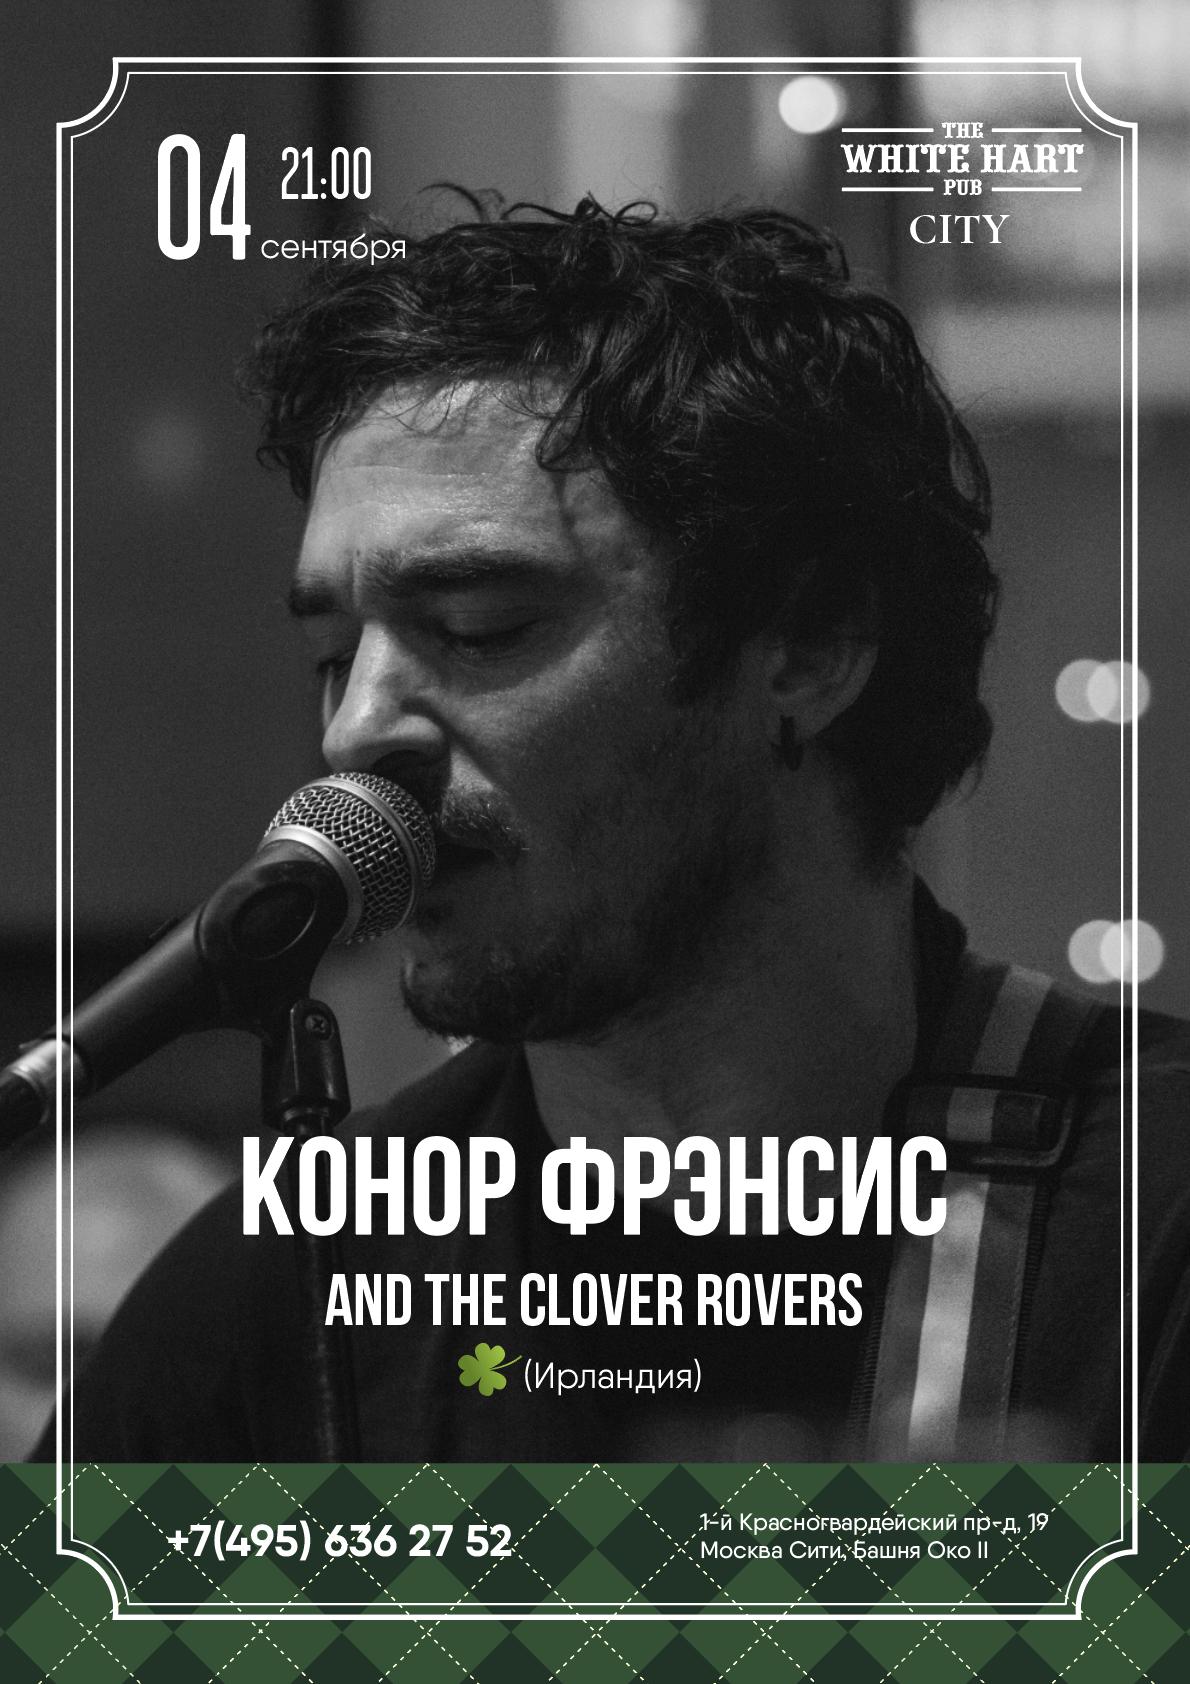 Афиша! 04 сентября — Ирландский певец Конор Фрэнсис  в White Hart Pub Moscow City